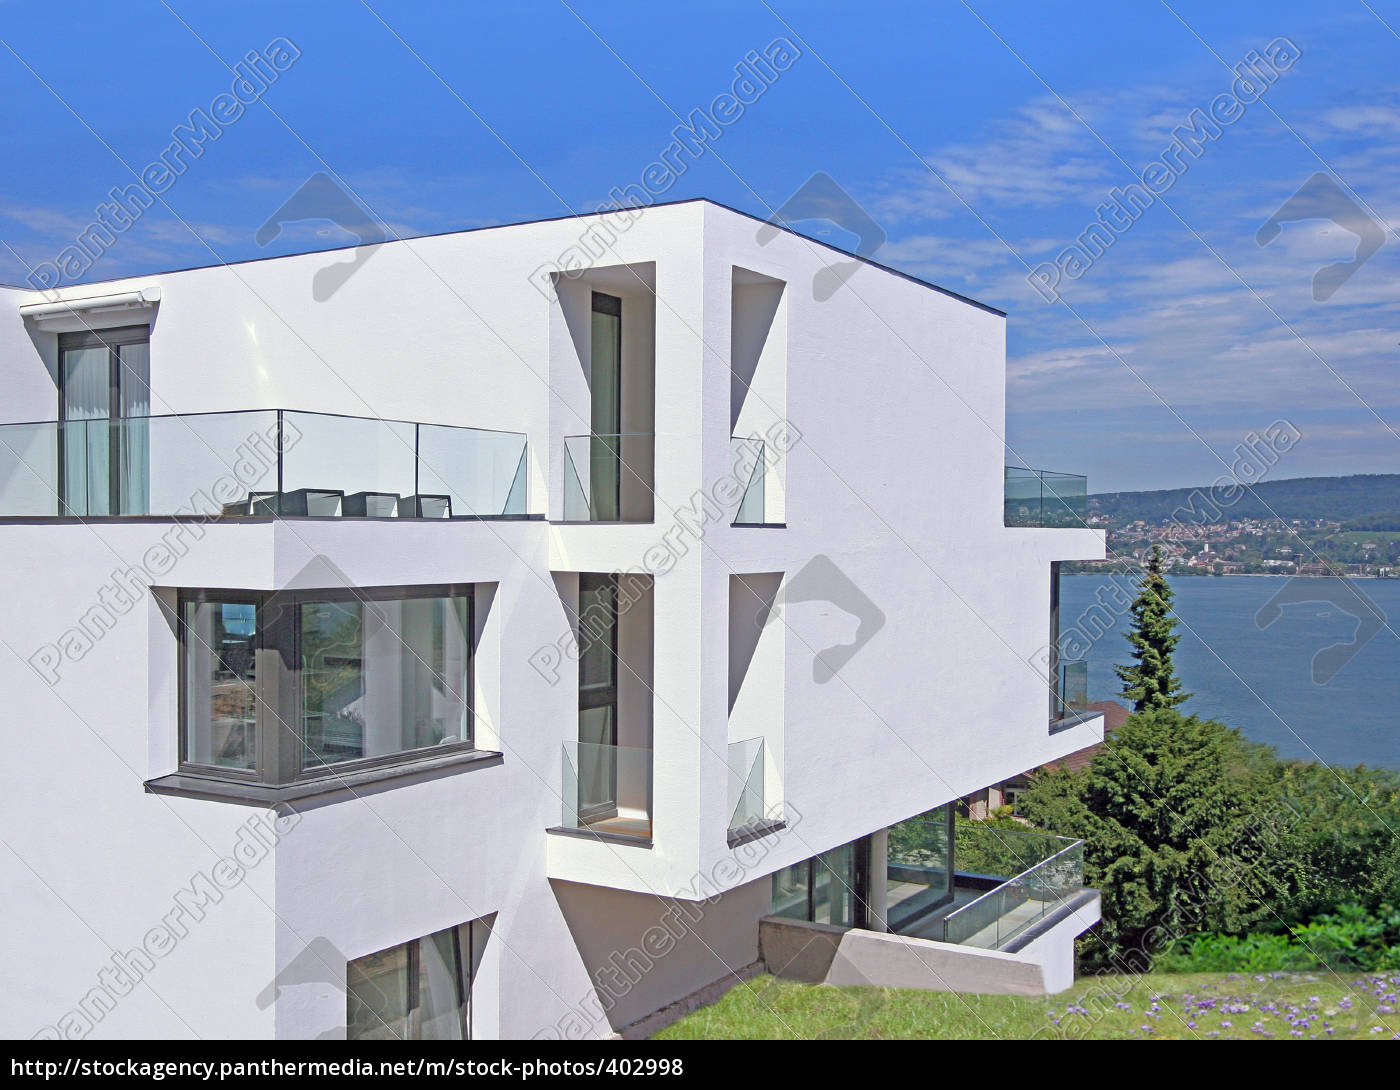 dream, house - 402998